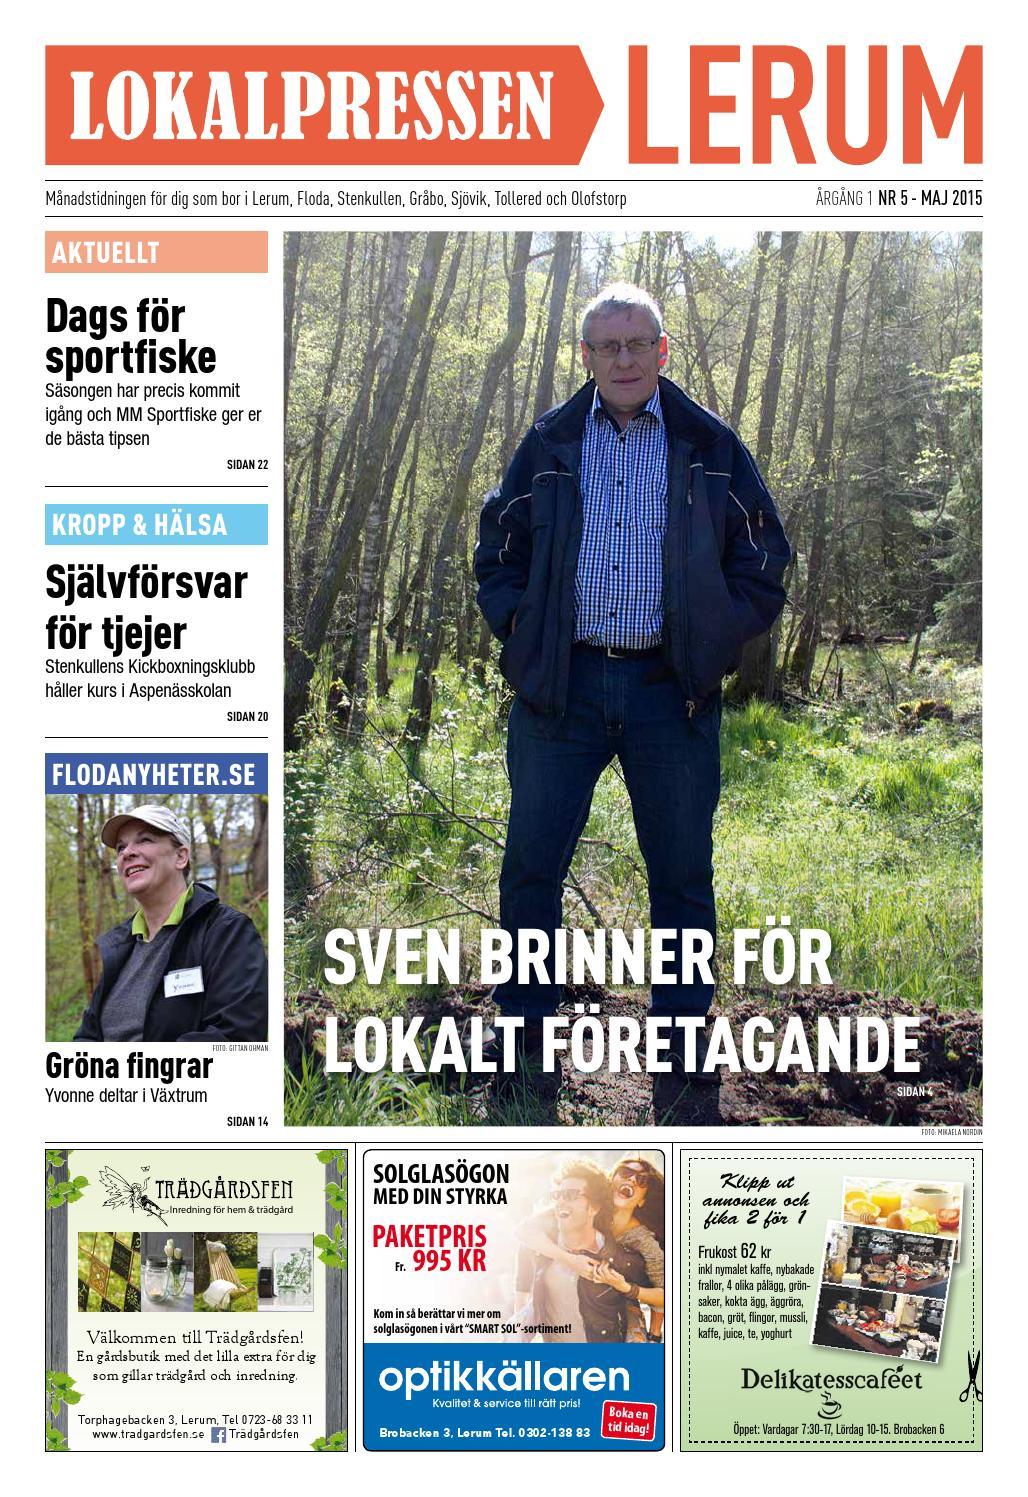 Lokalpressen Lerum Nr 5 2015 By Lokalpressen Issuu